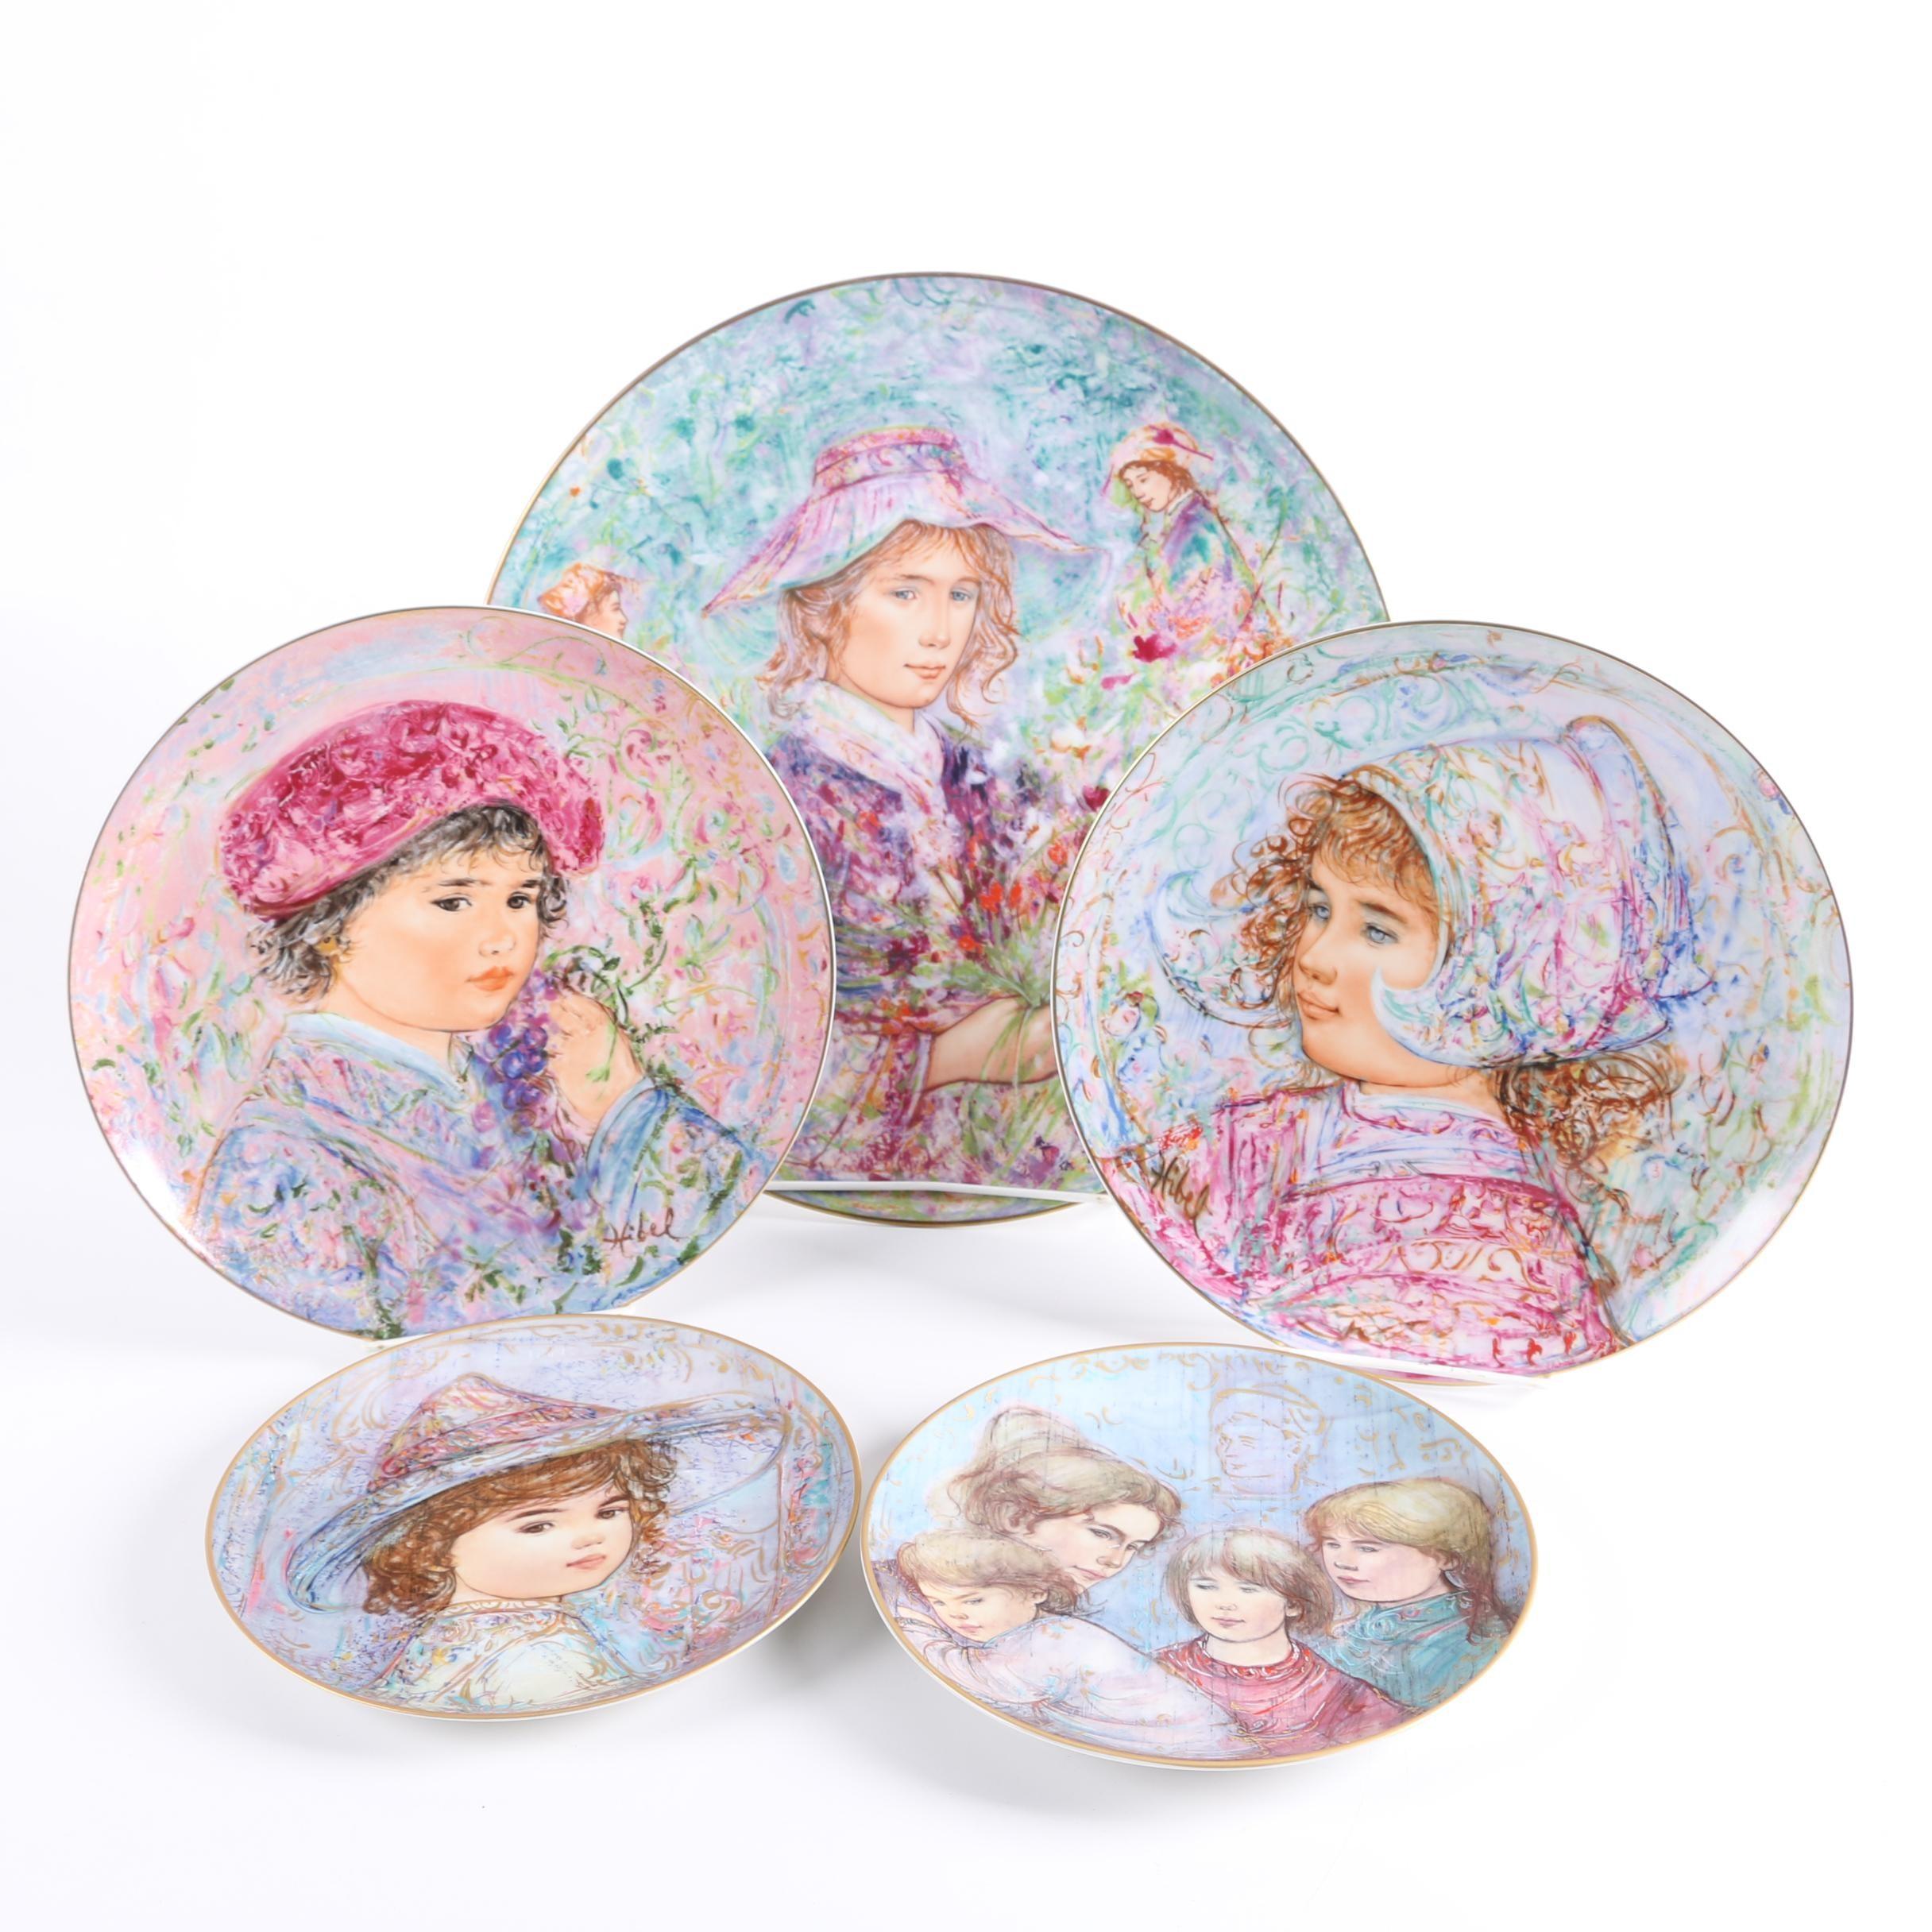 "Edna Hibel Limited Edition Commemorative Plates Including ""Nobility of Children"""